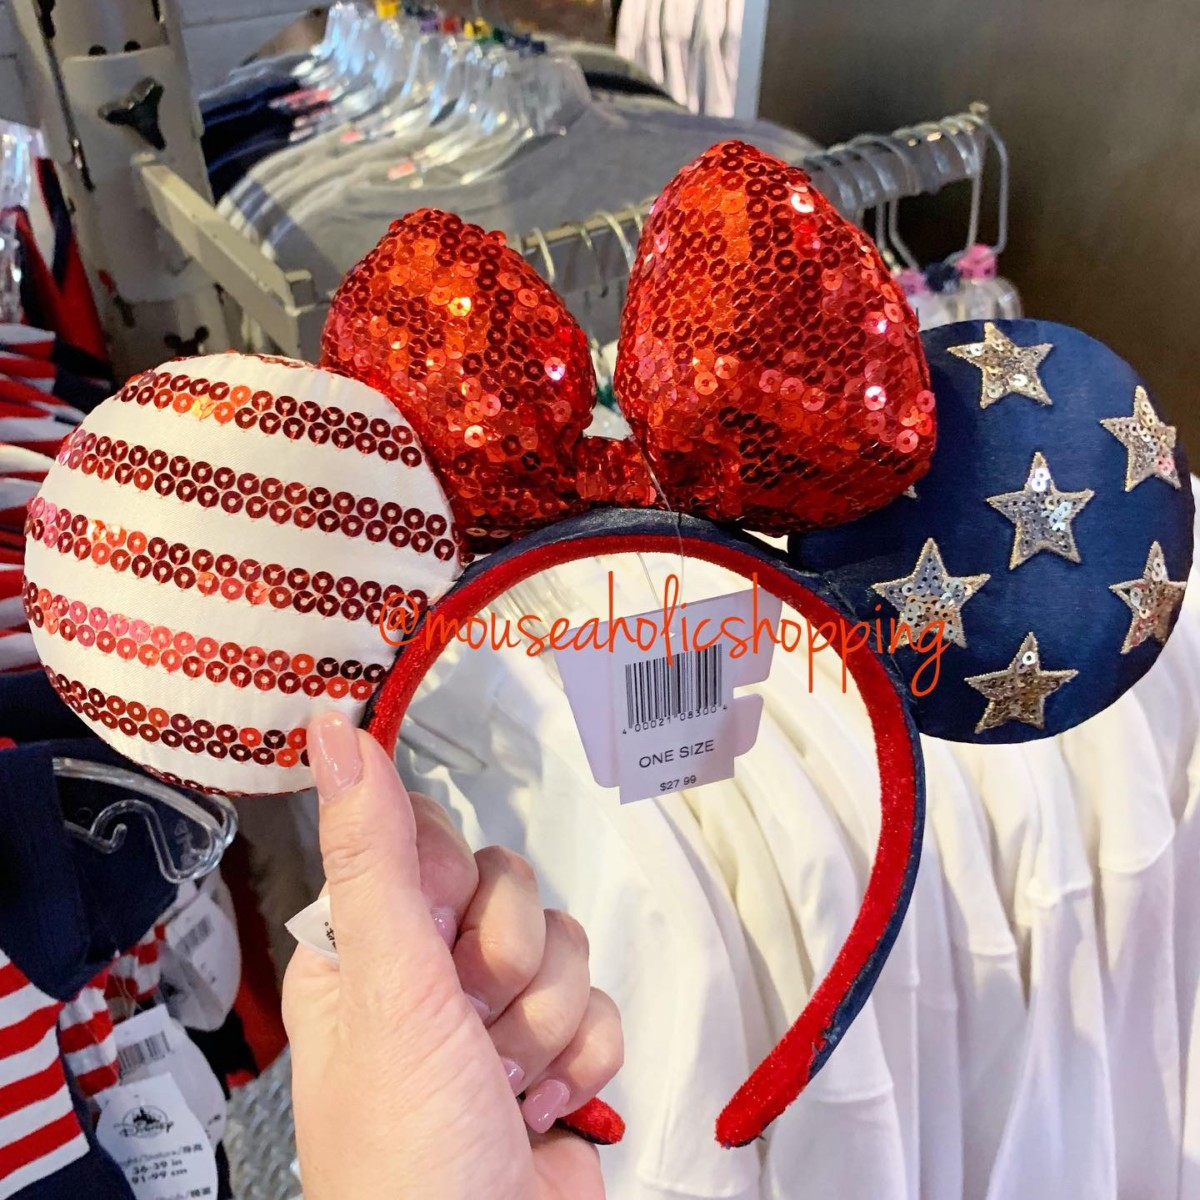 Patriotic Americana Merchandise Sails Into Disney Parks 3